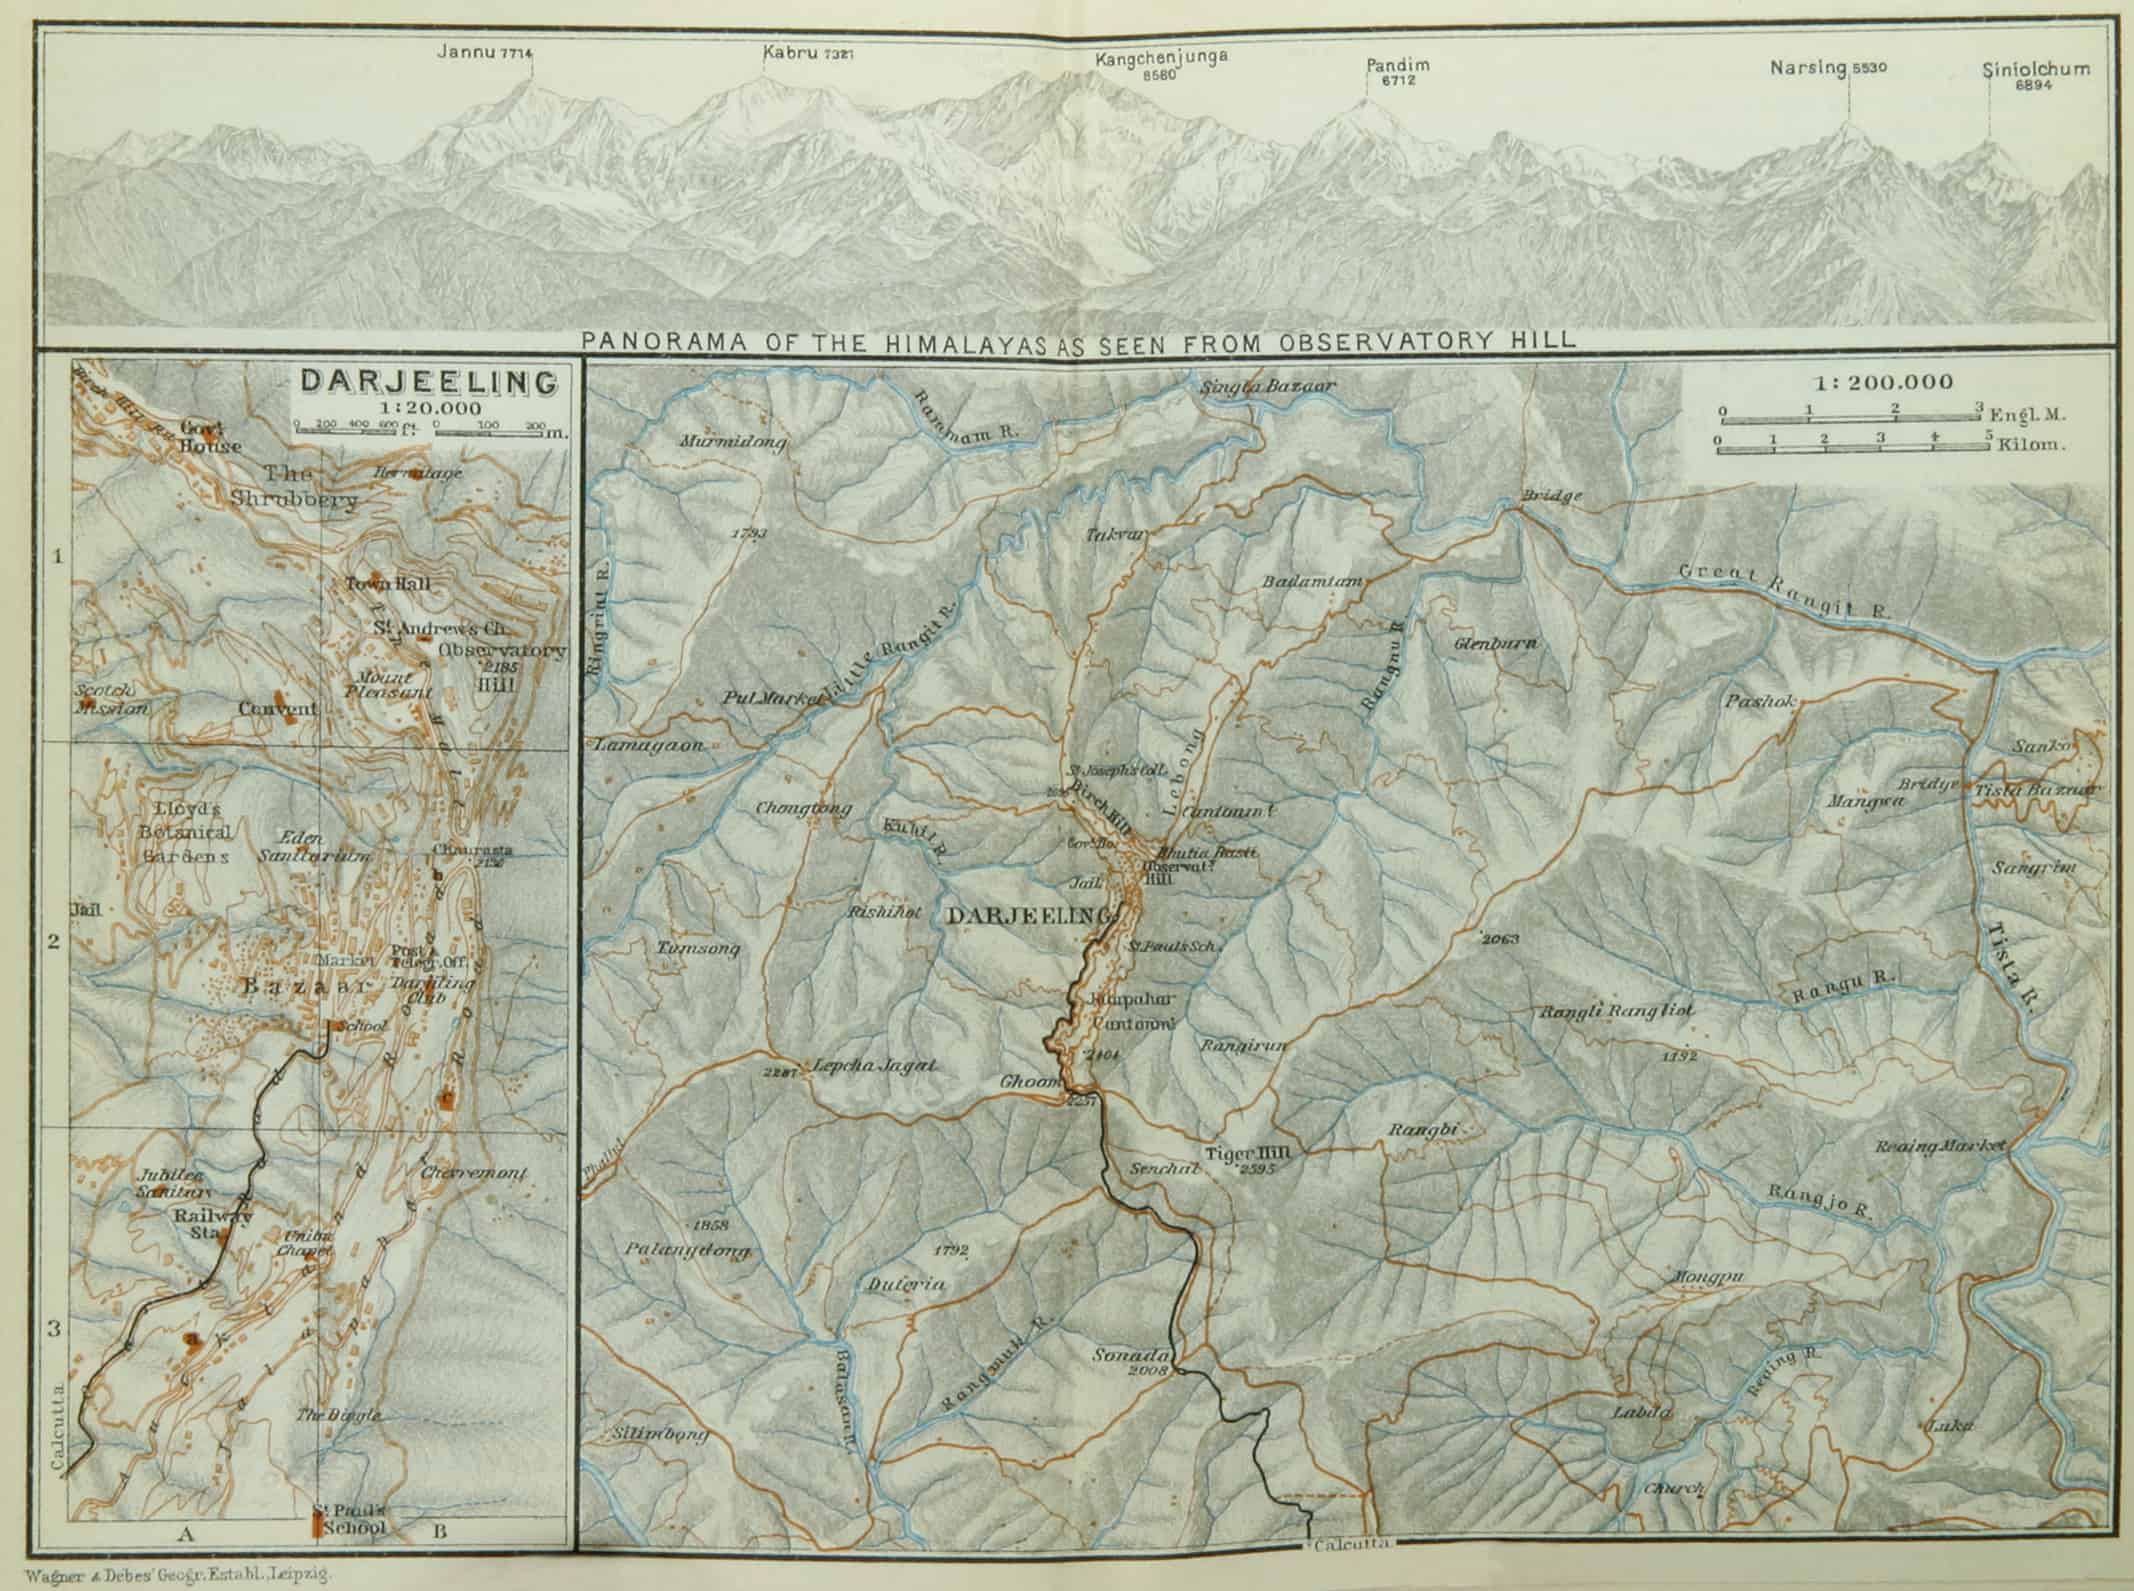 Darjeeling map circa 1914